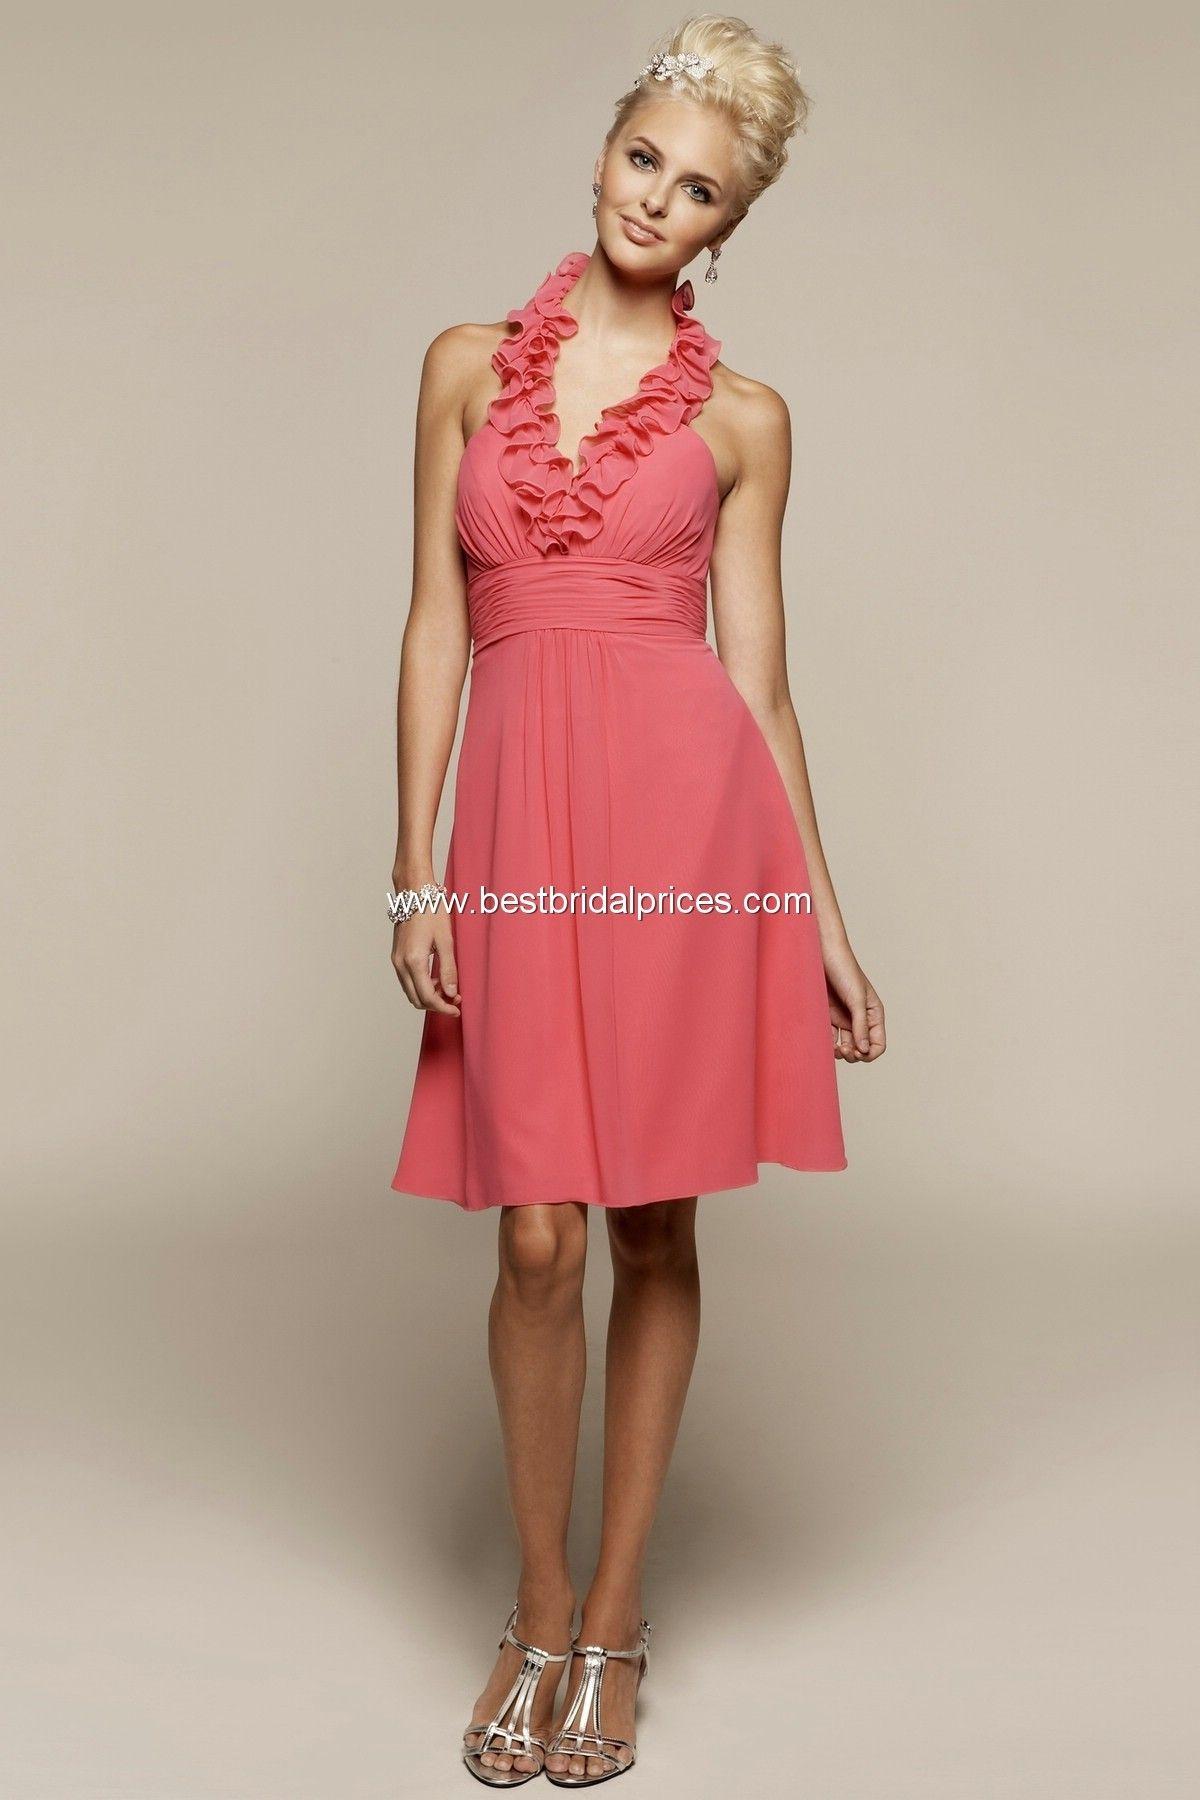 Liz Fields Bridesmaid Dresses   Style 362  362     138 00   Wedding Dresses Liz Fields Bridesmaid Dresses   Style 362  362     138 00  . Liz Fields Wedding Dresses. Home Design Ideas